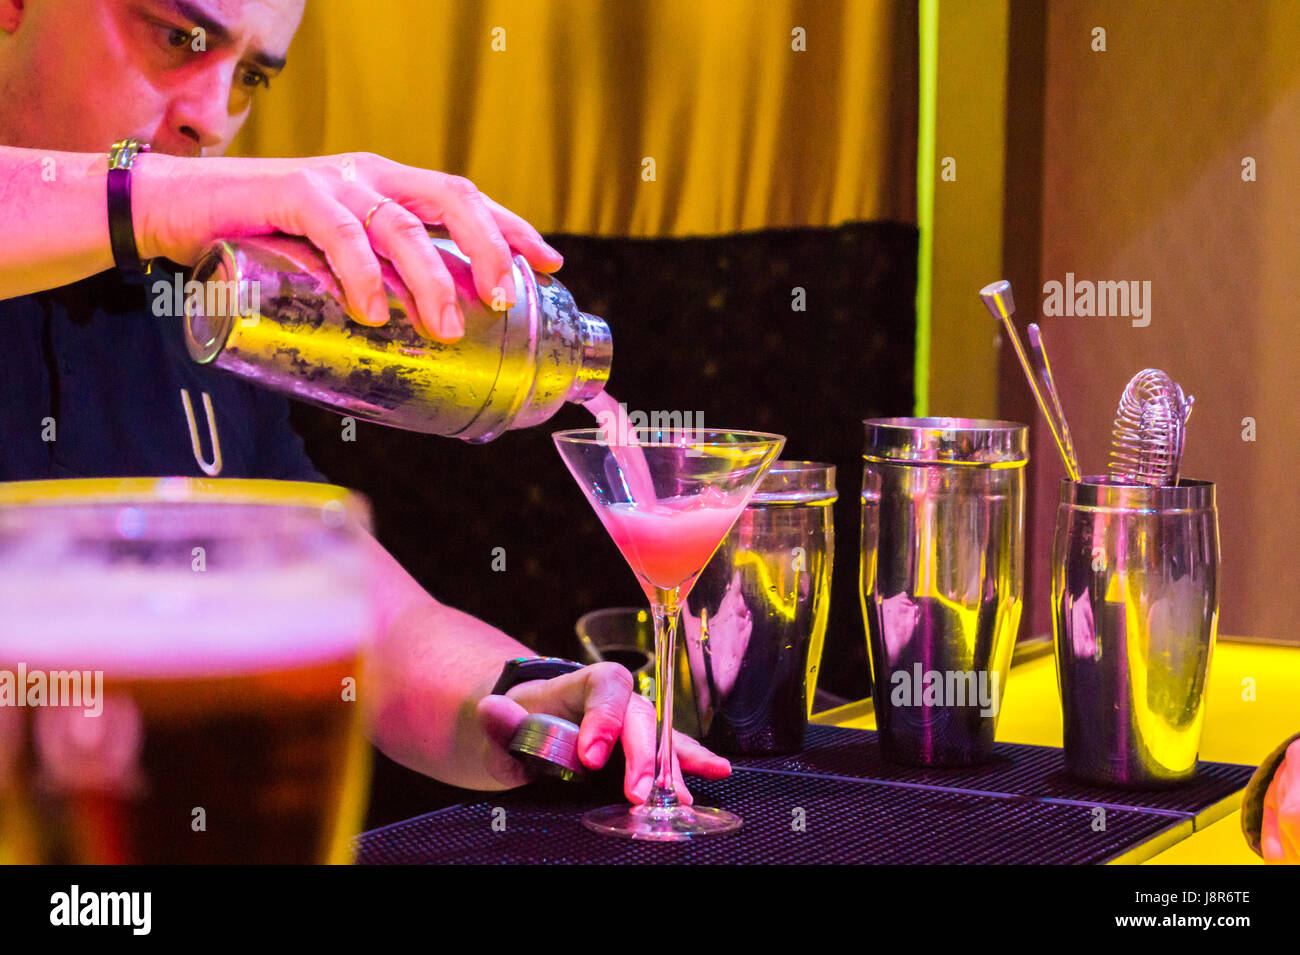 Barman pouring a Cosmopolitan cocktail at Urban Cocktail Club bar, Oviedo Asturias Spain Stock Photo